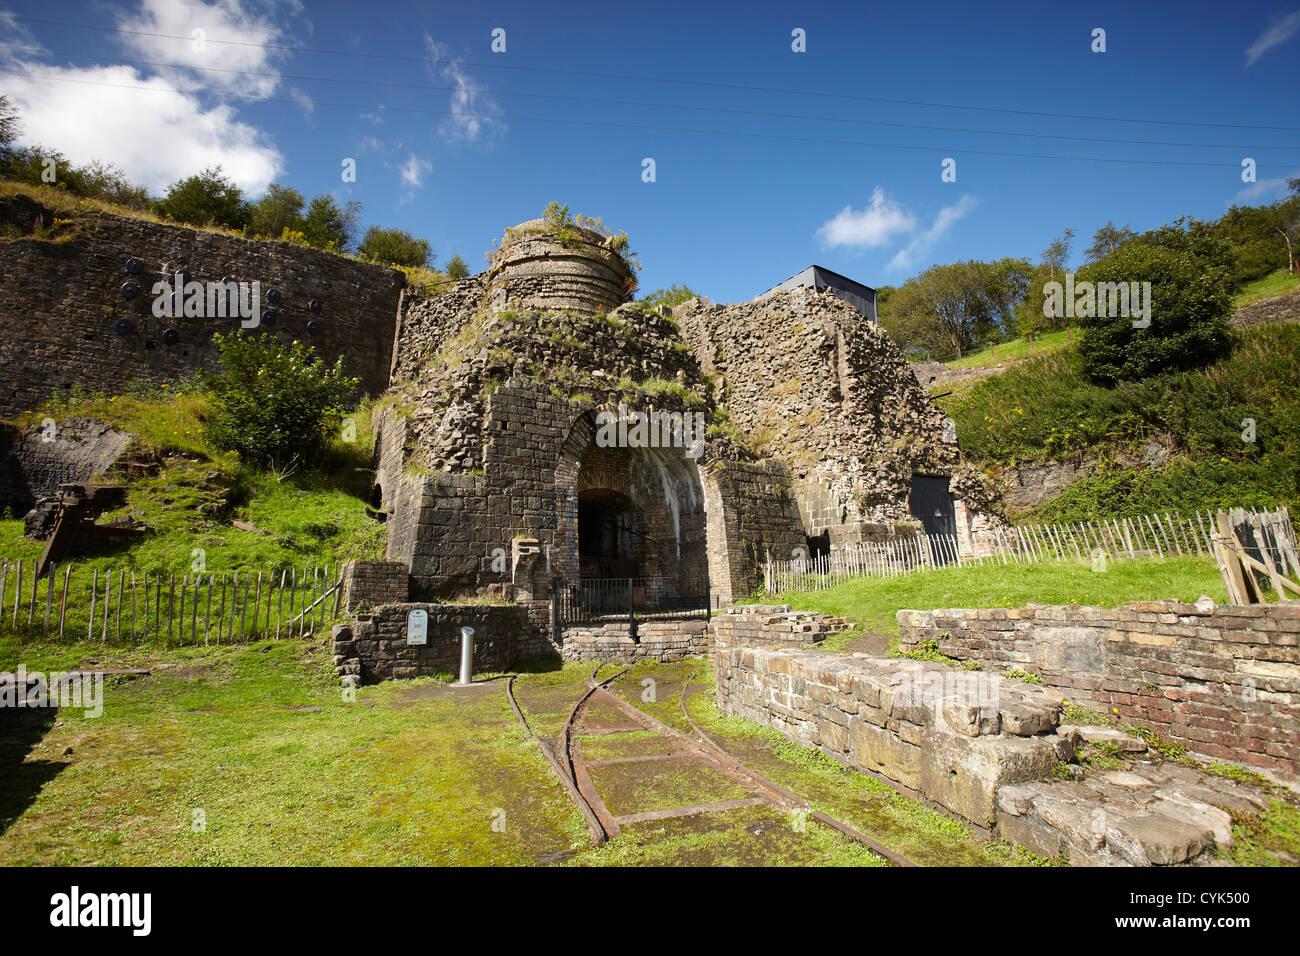 Remains of the furnace, Blaenavon Ironworks museum, Blaenavon, Wales, UK - Stock Image